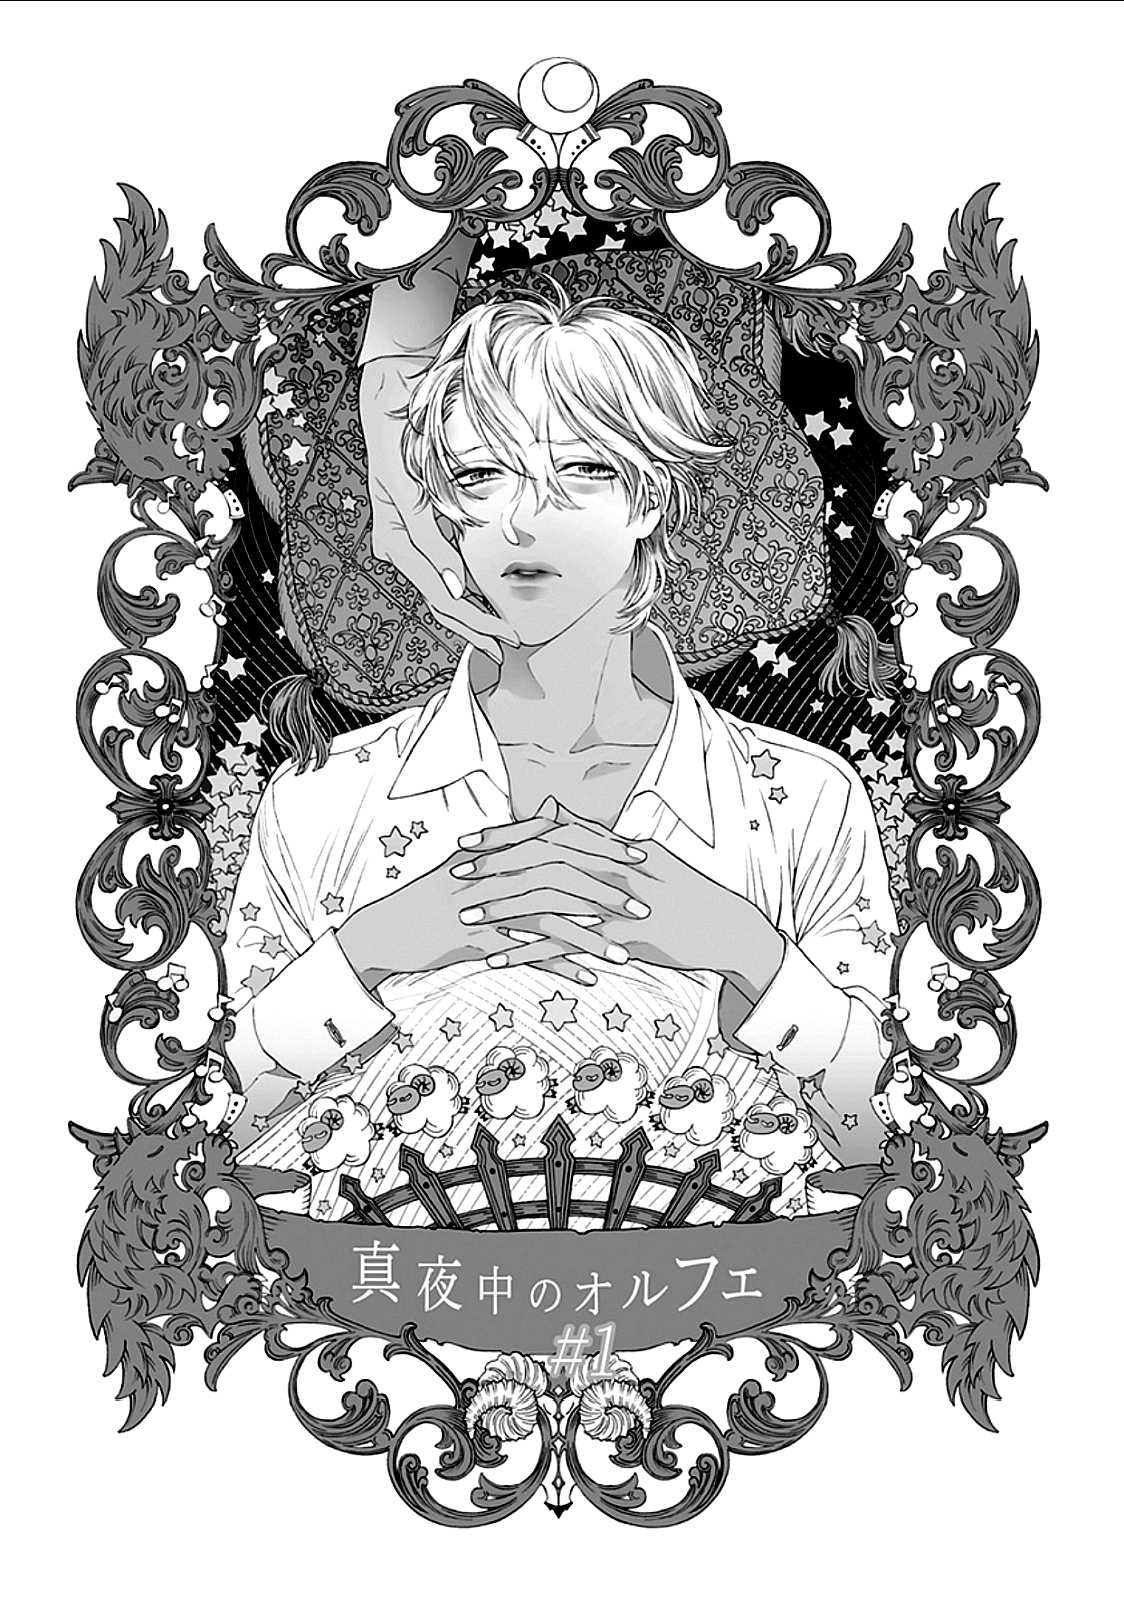 Orpheus of midnight - Chapter 1